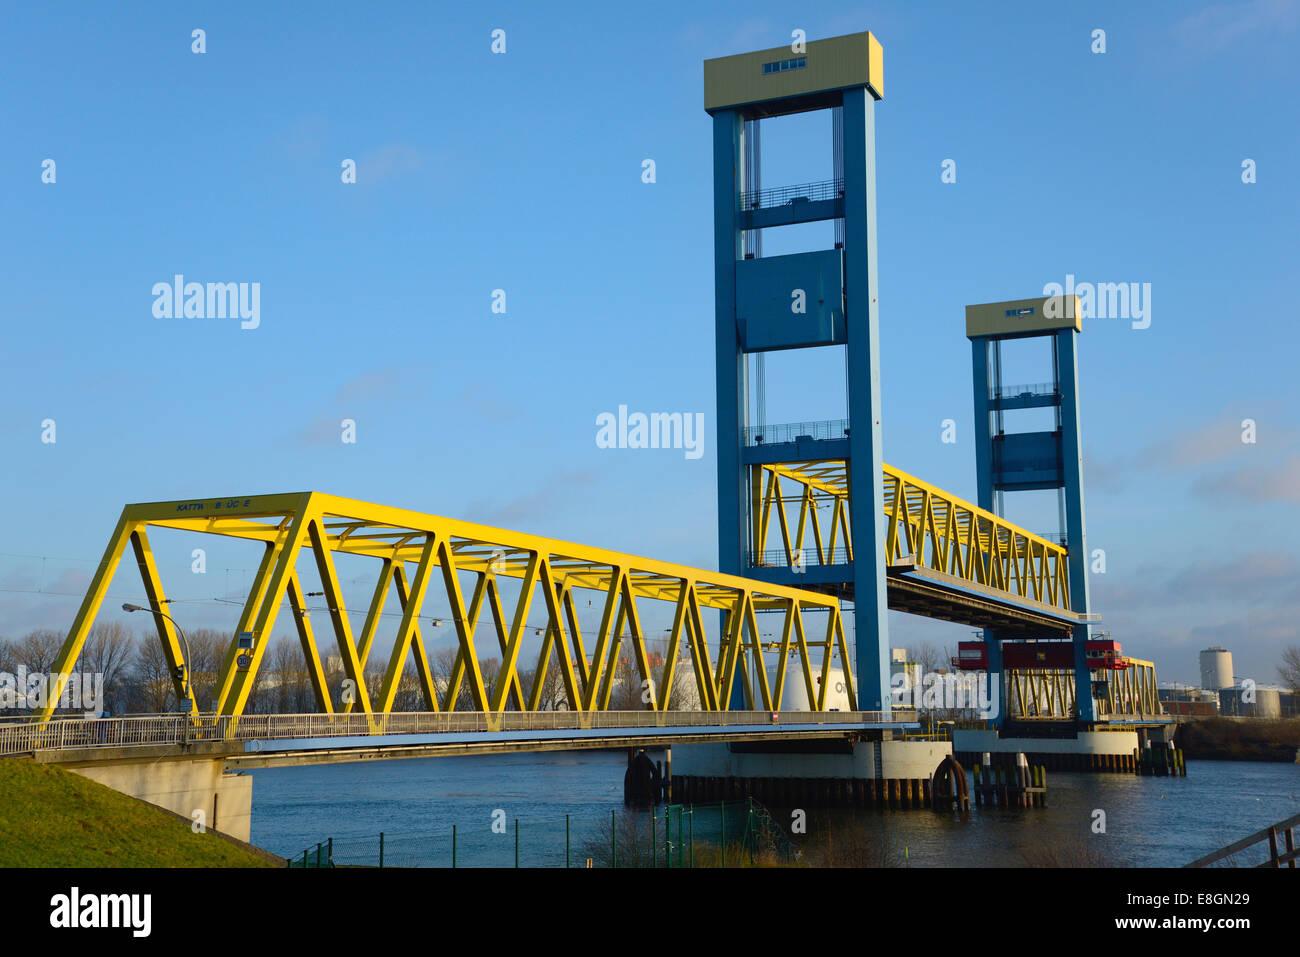 Kattwyk Bridge, vertical-lift bridge over the Southern Elbe River, Hamburg, Germany - Stock Image